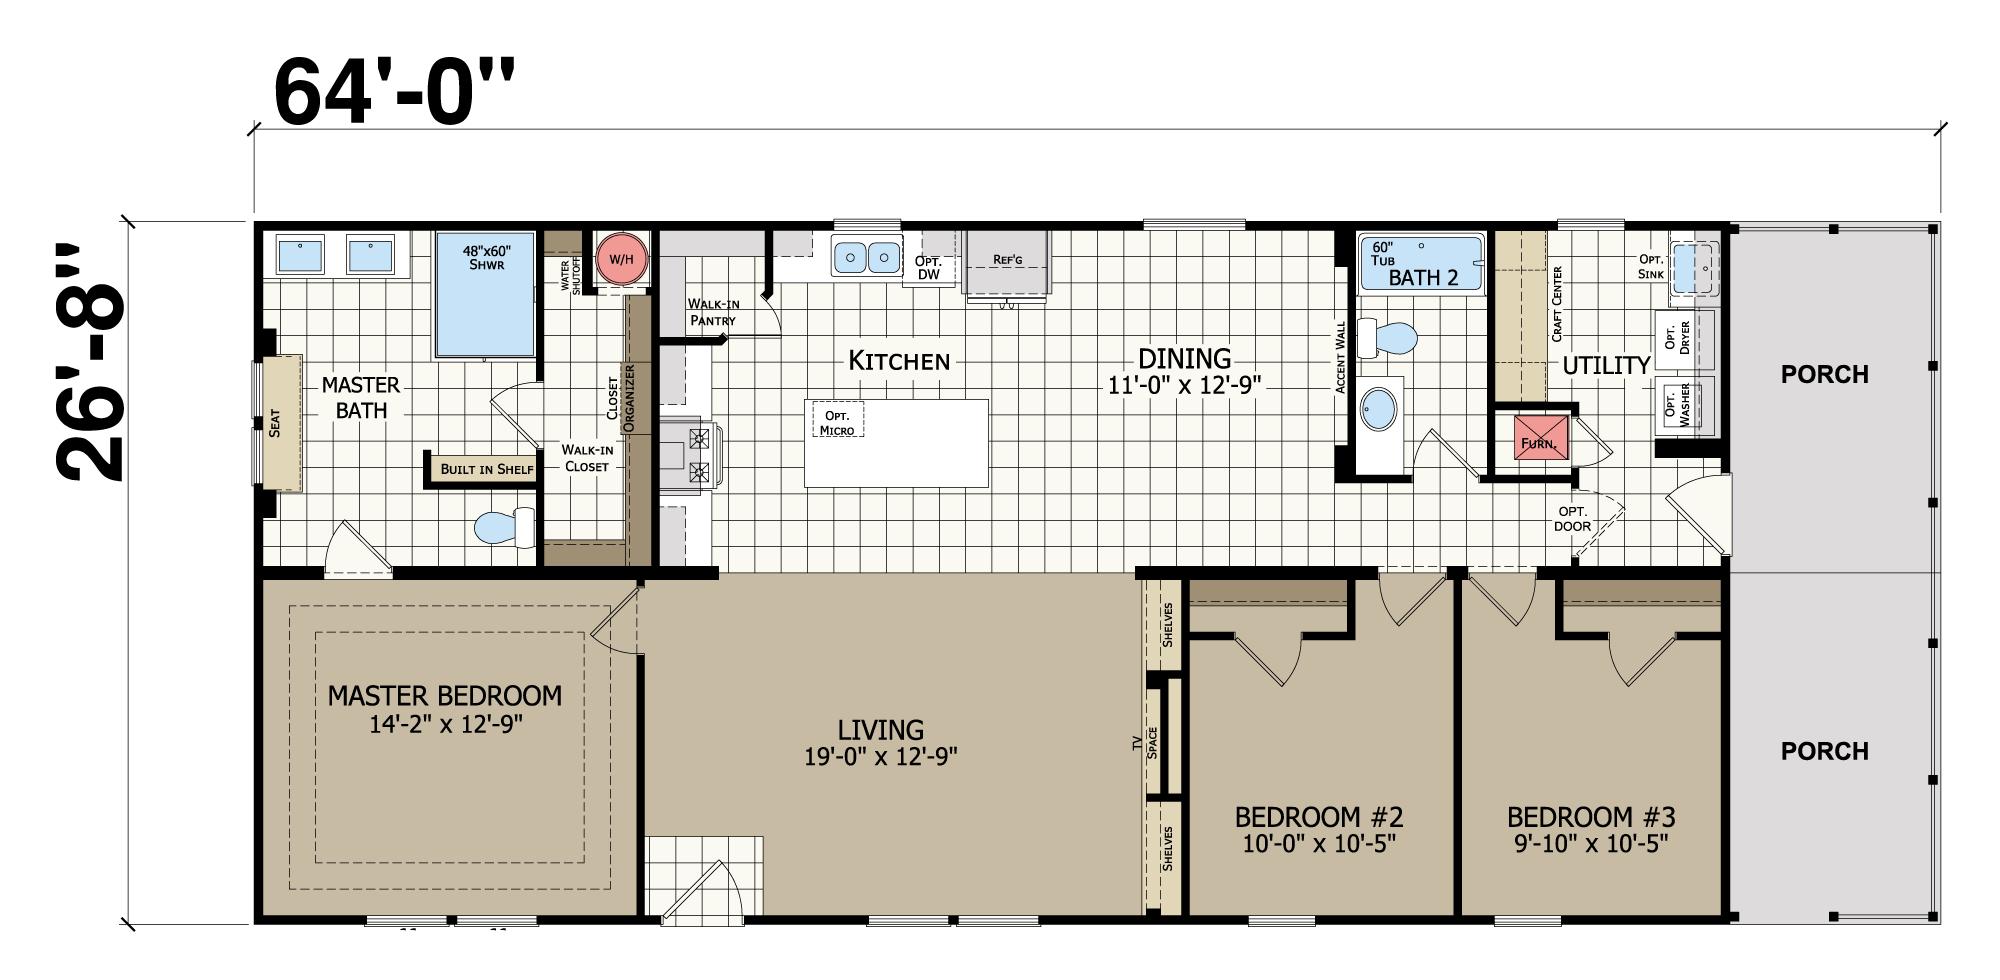 floorplan image for unit 377